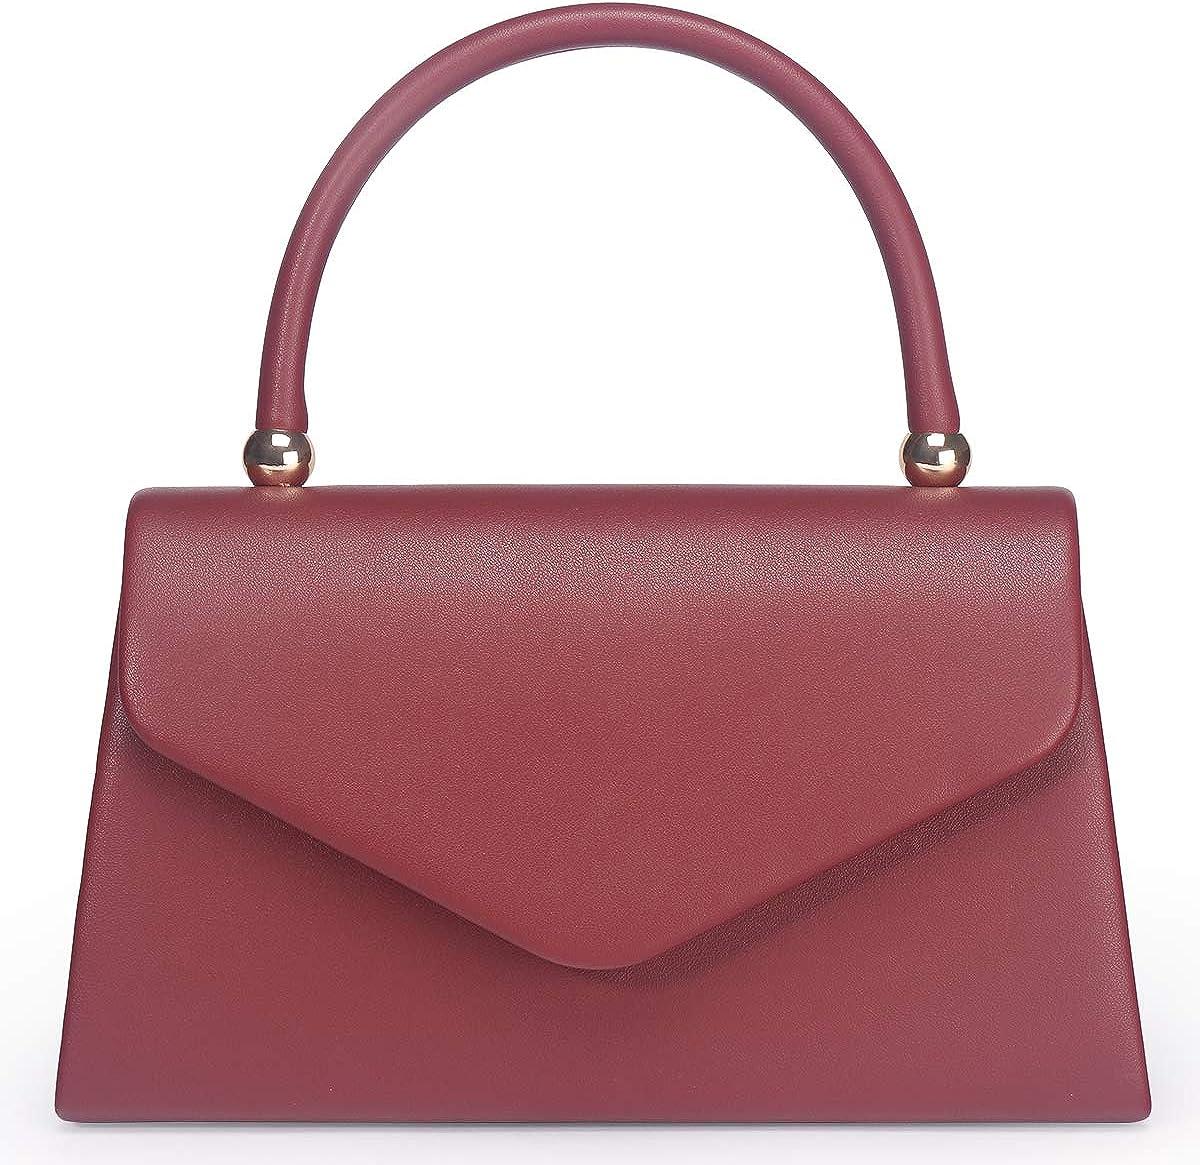 Women's Classic Envelope Evening Bag, WALLYN'S Wedding Prom Party Clutch Handbag Purse